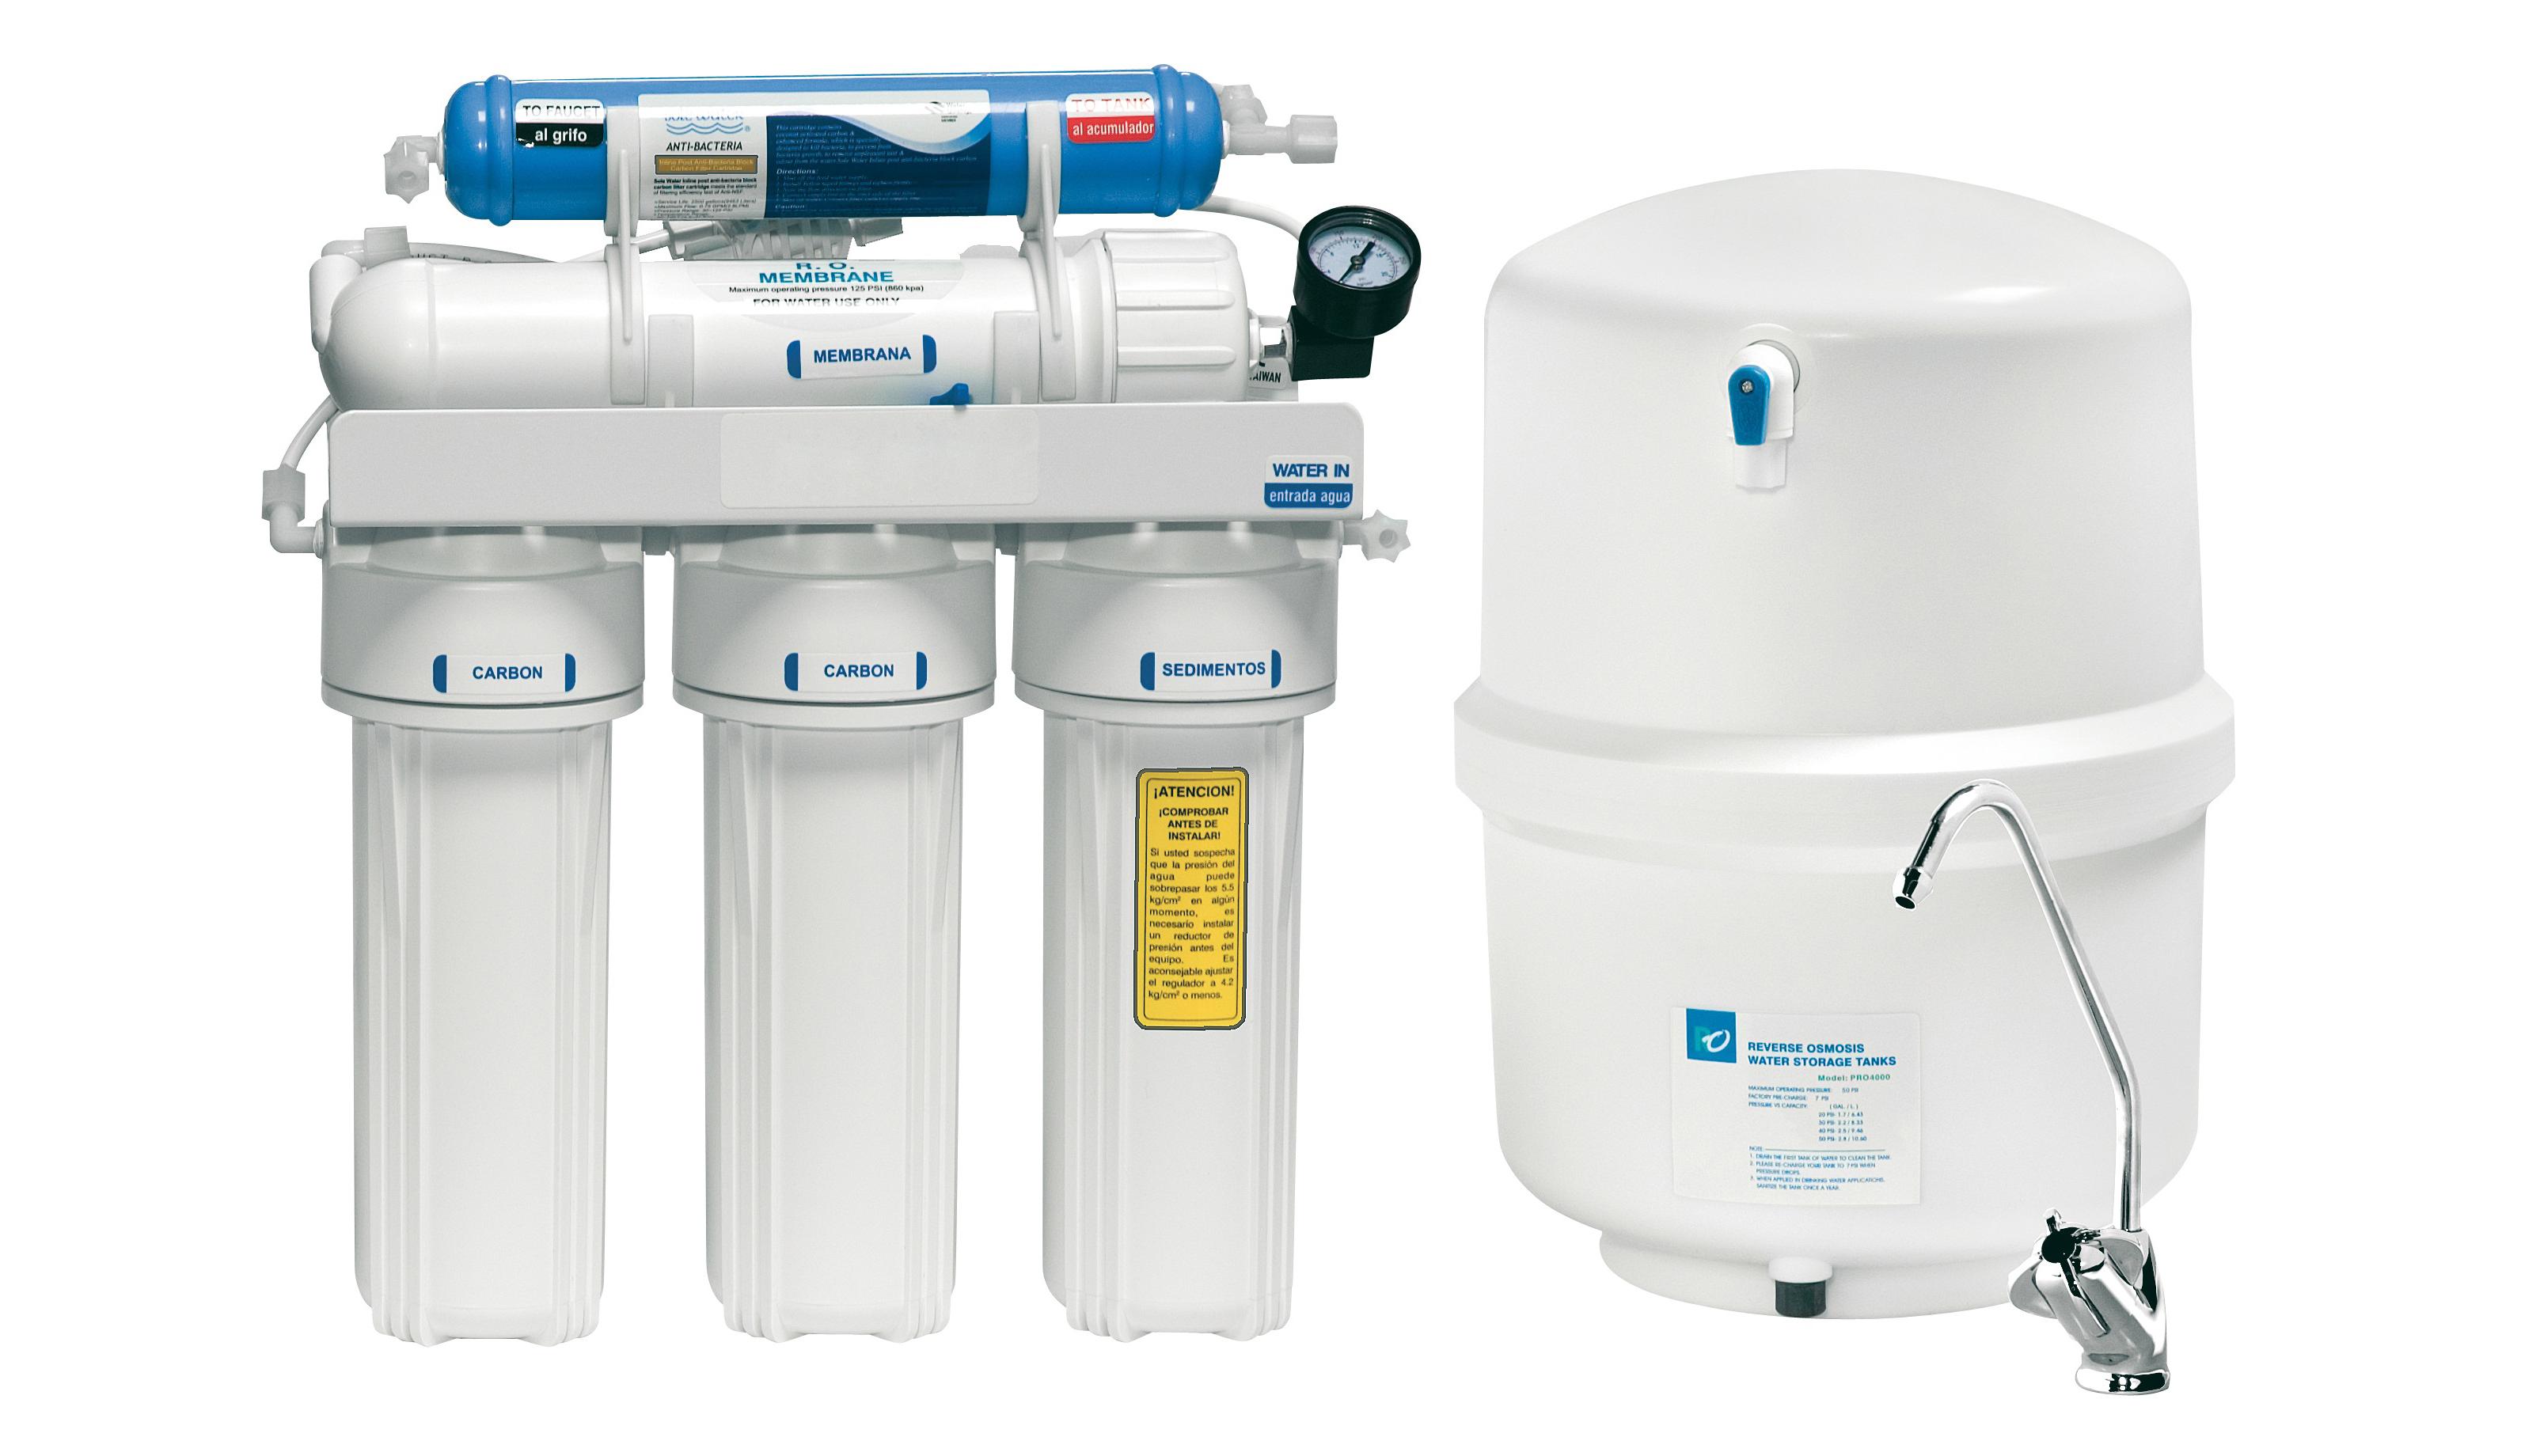 Fontaner a piscinas aire acondicionado riego tuber as p v - Agua de osmosis ...